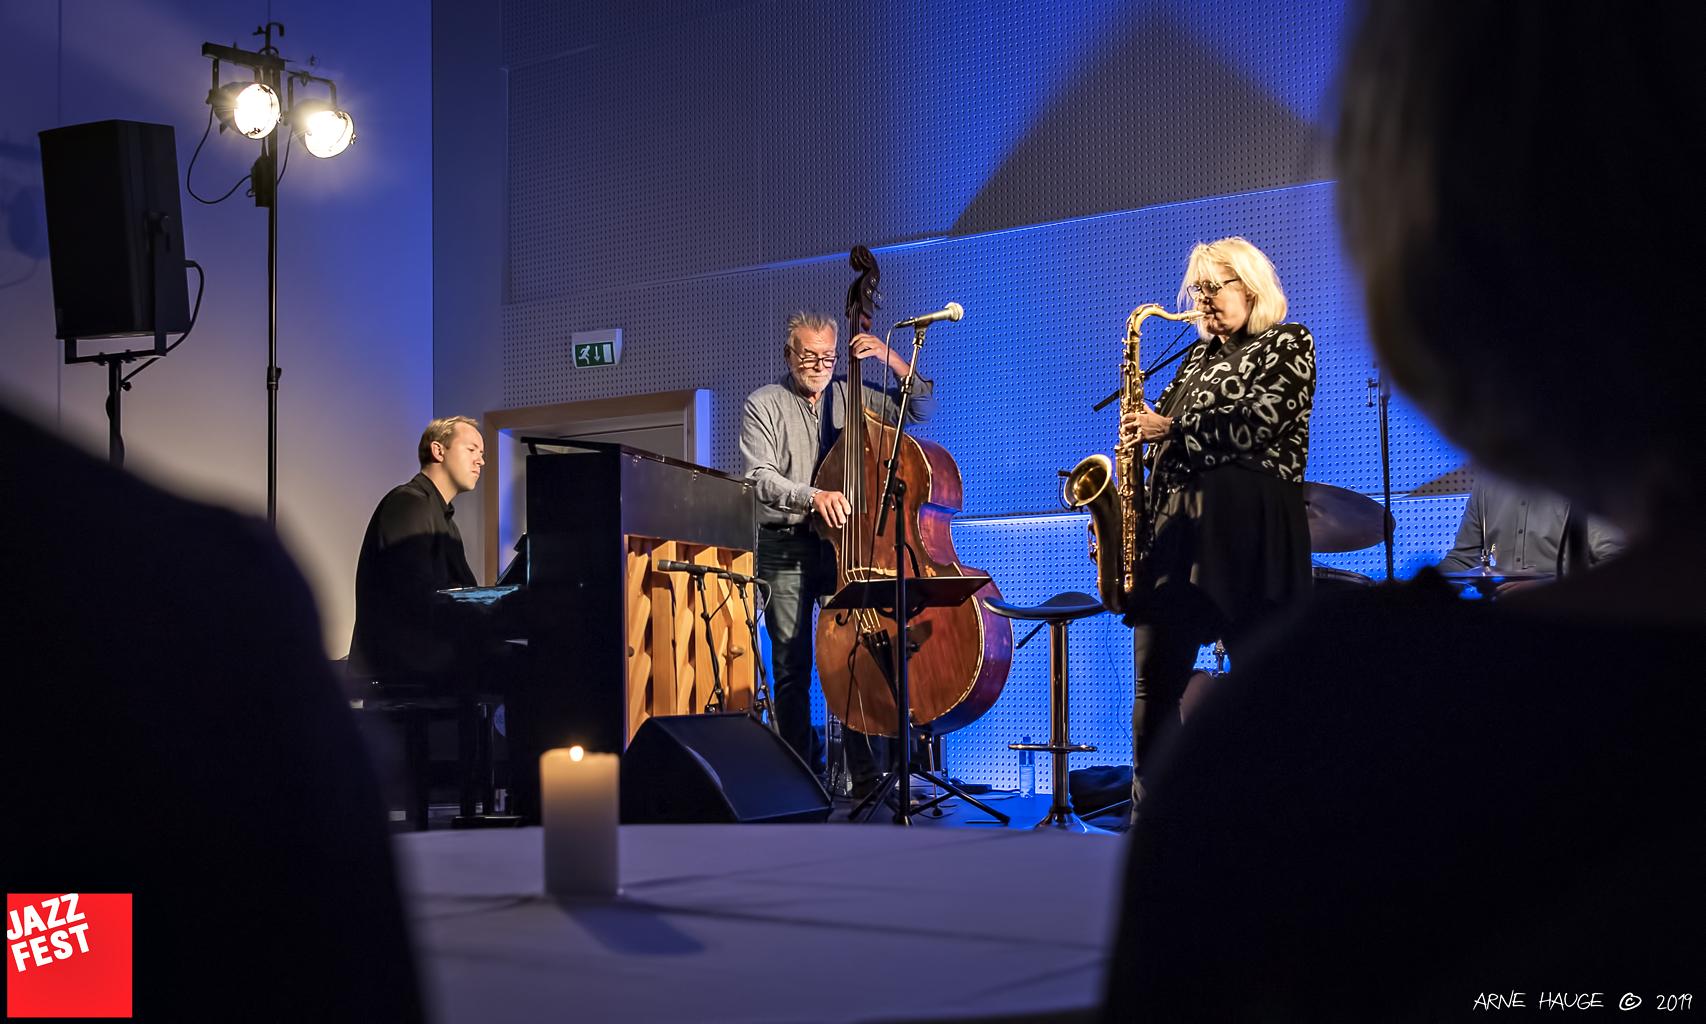 190512 Bodil Niska Kvartett @ Scandic Nidelven - foto Arne Hauge_TMP_001.jpg